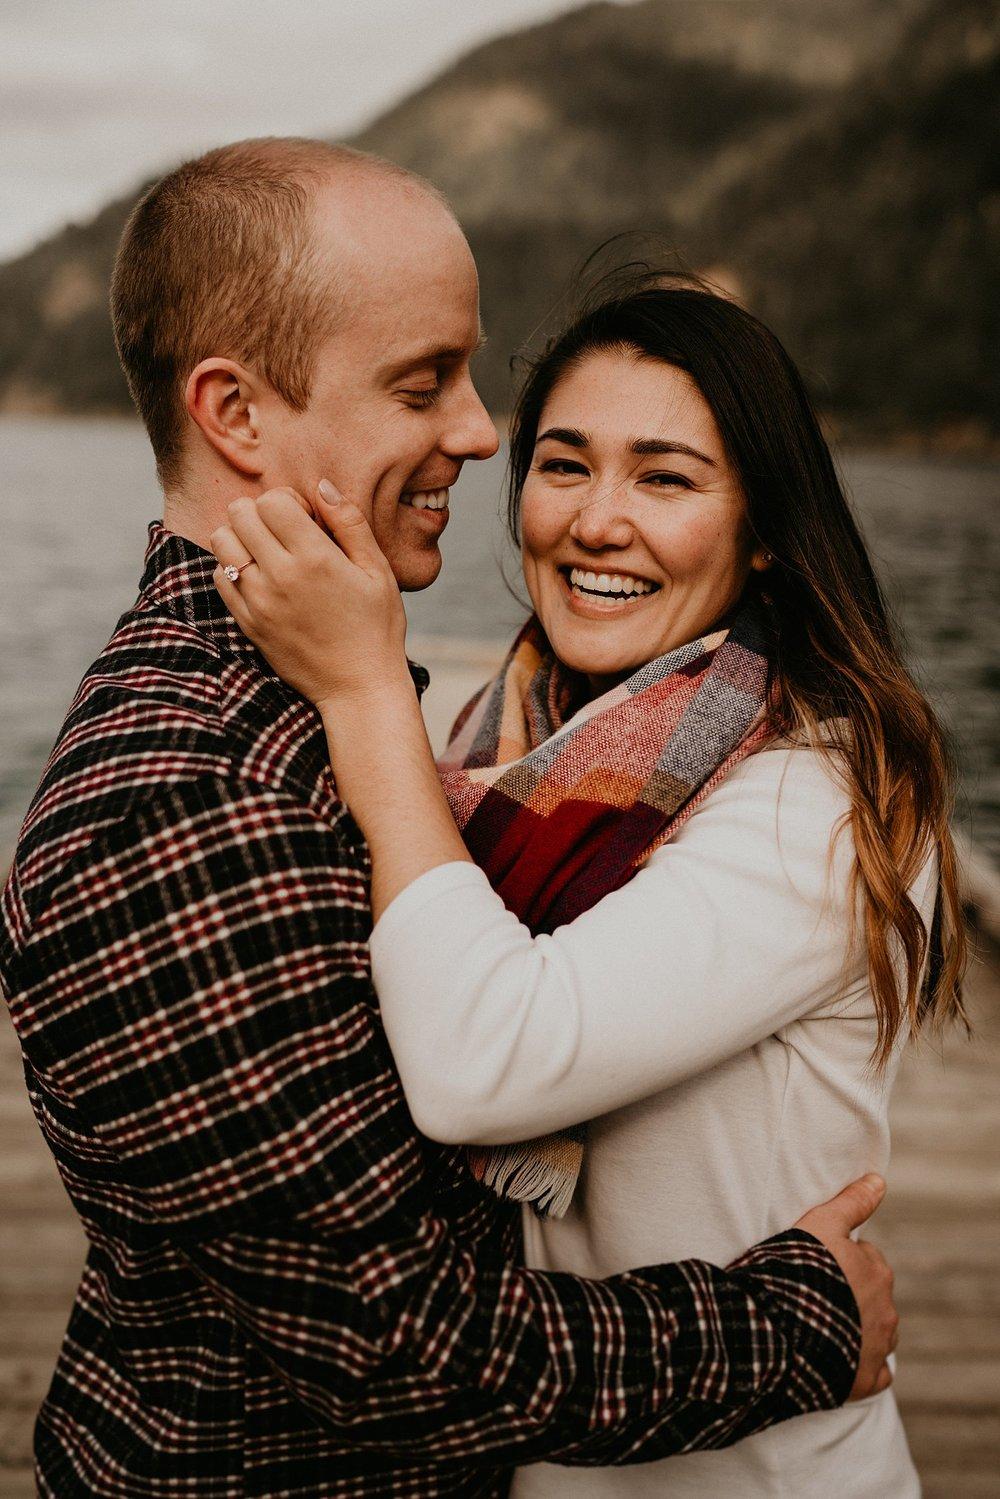 Lake-Crescent-Mount-Storm-King-Hiking-Adventure-Engagement-Seattle-Wedding-Photographer_0049.jpg